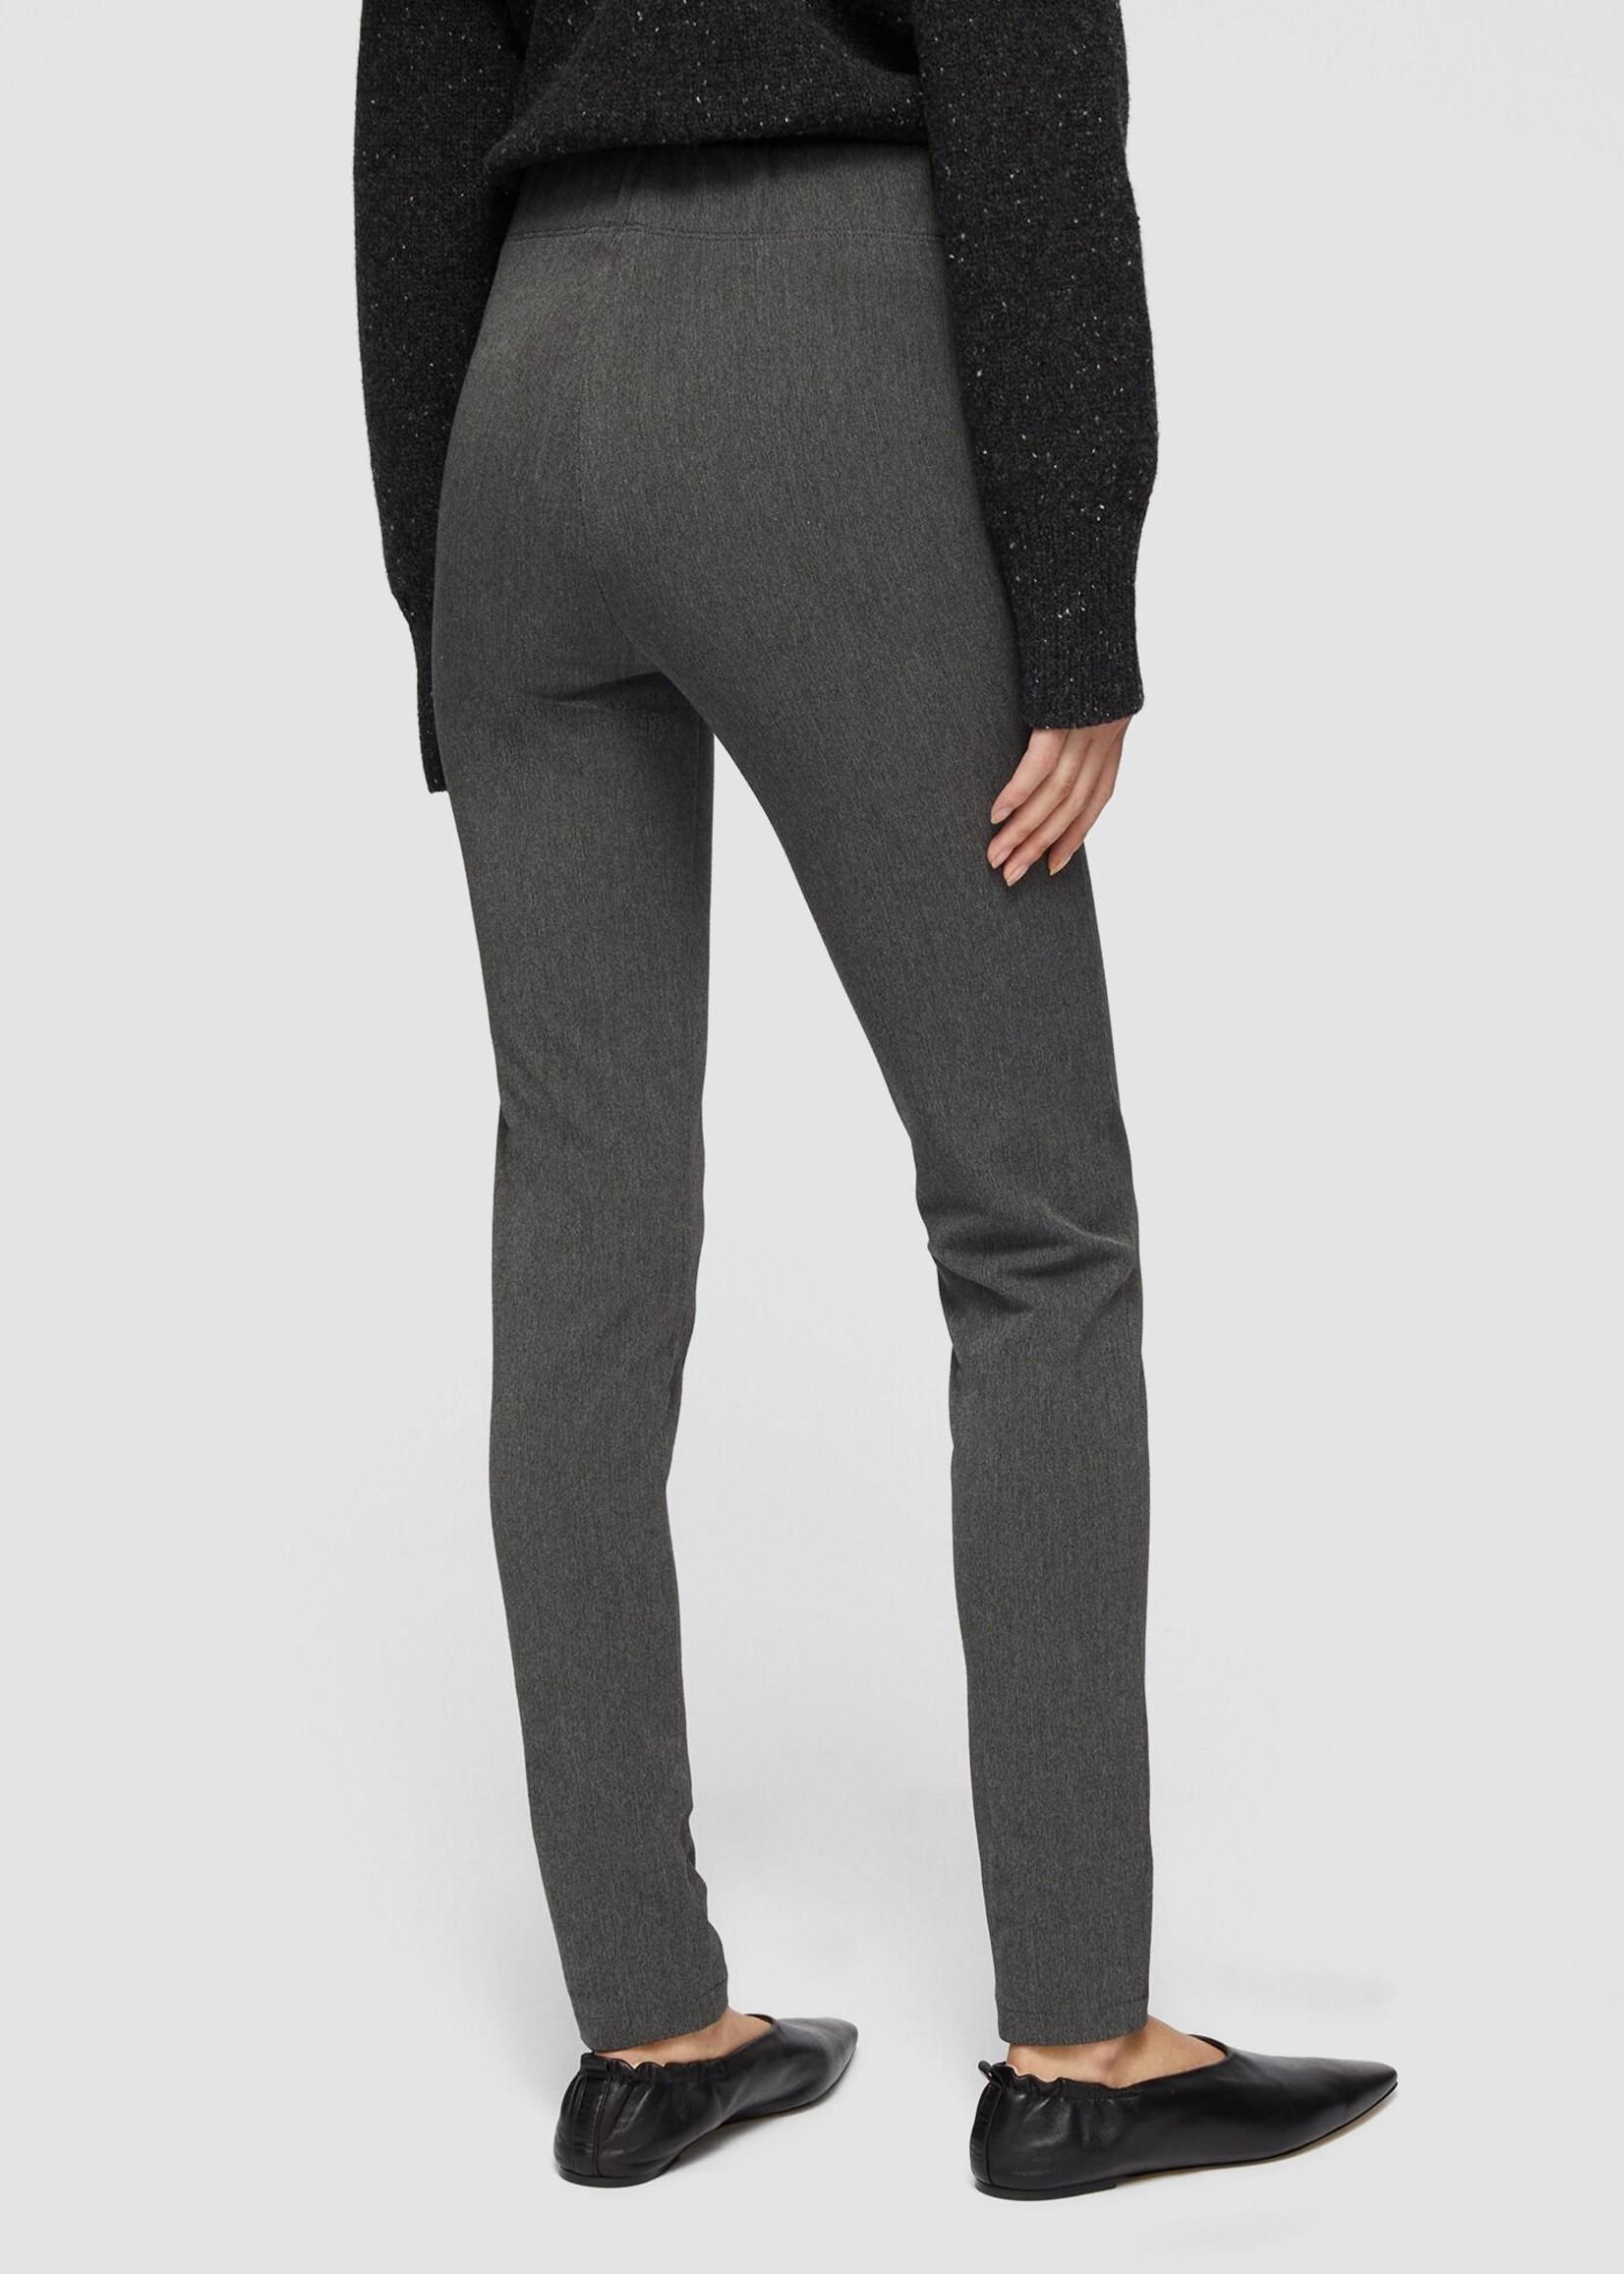 Joseph Joseph legging pant , dark grey